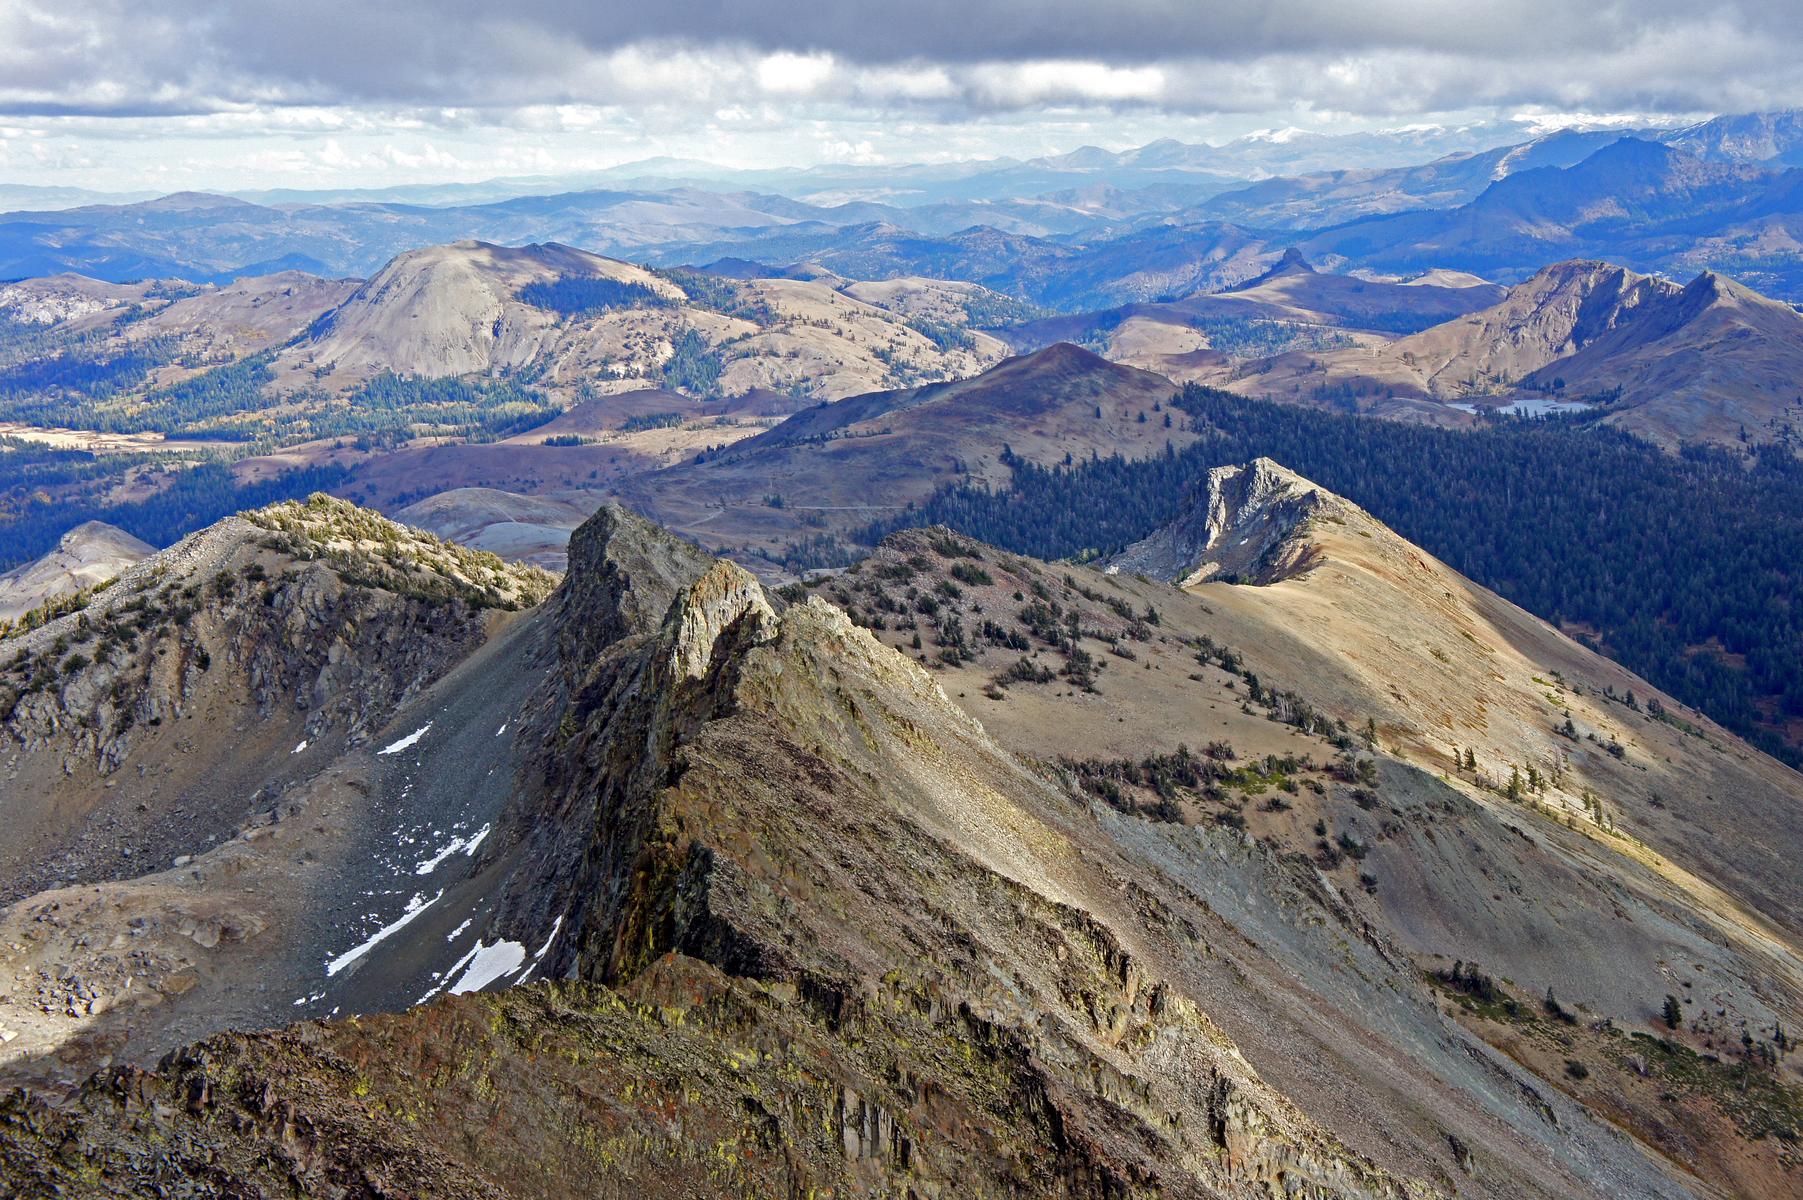 on the summit of Round Top, near Carson Pass in the Mokelumne Wilderness, California